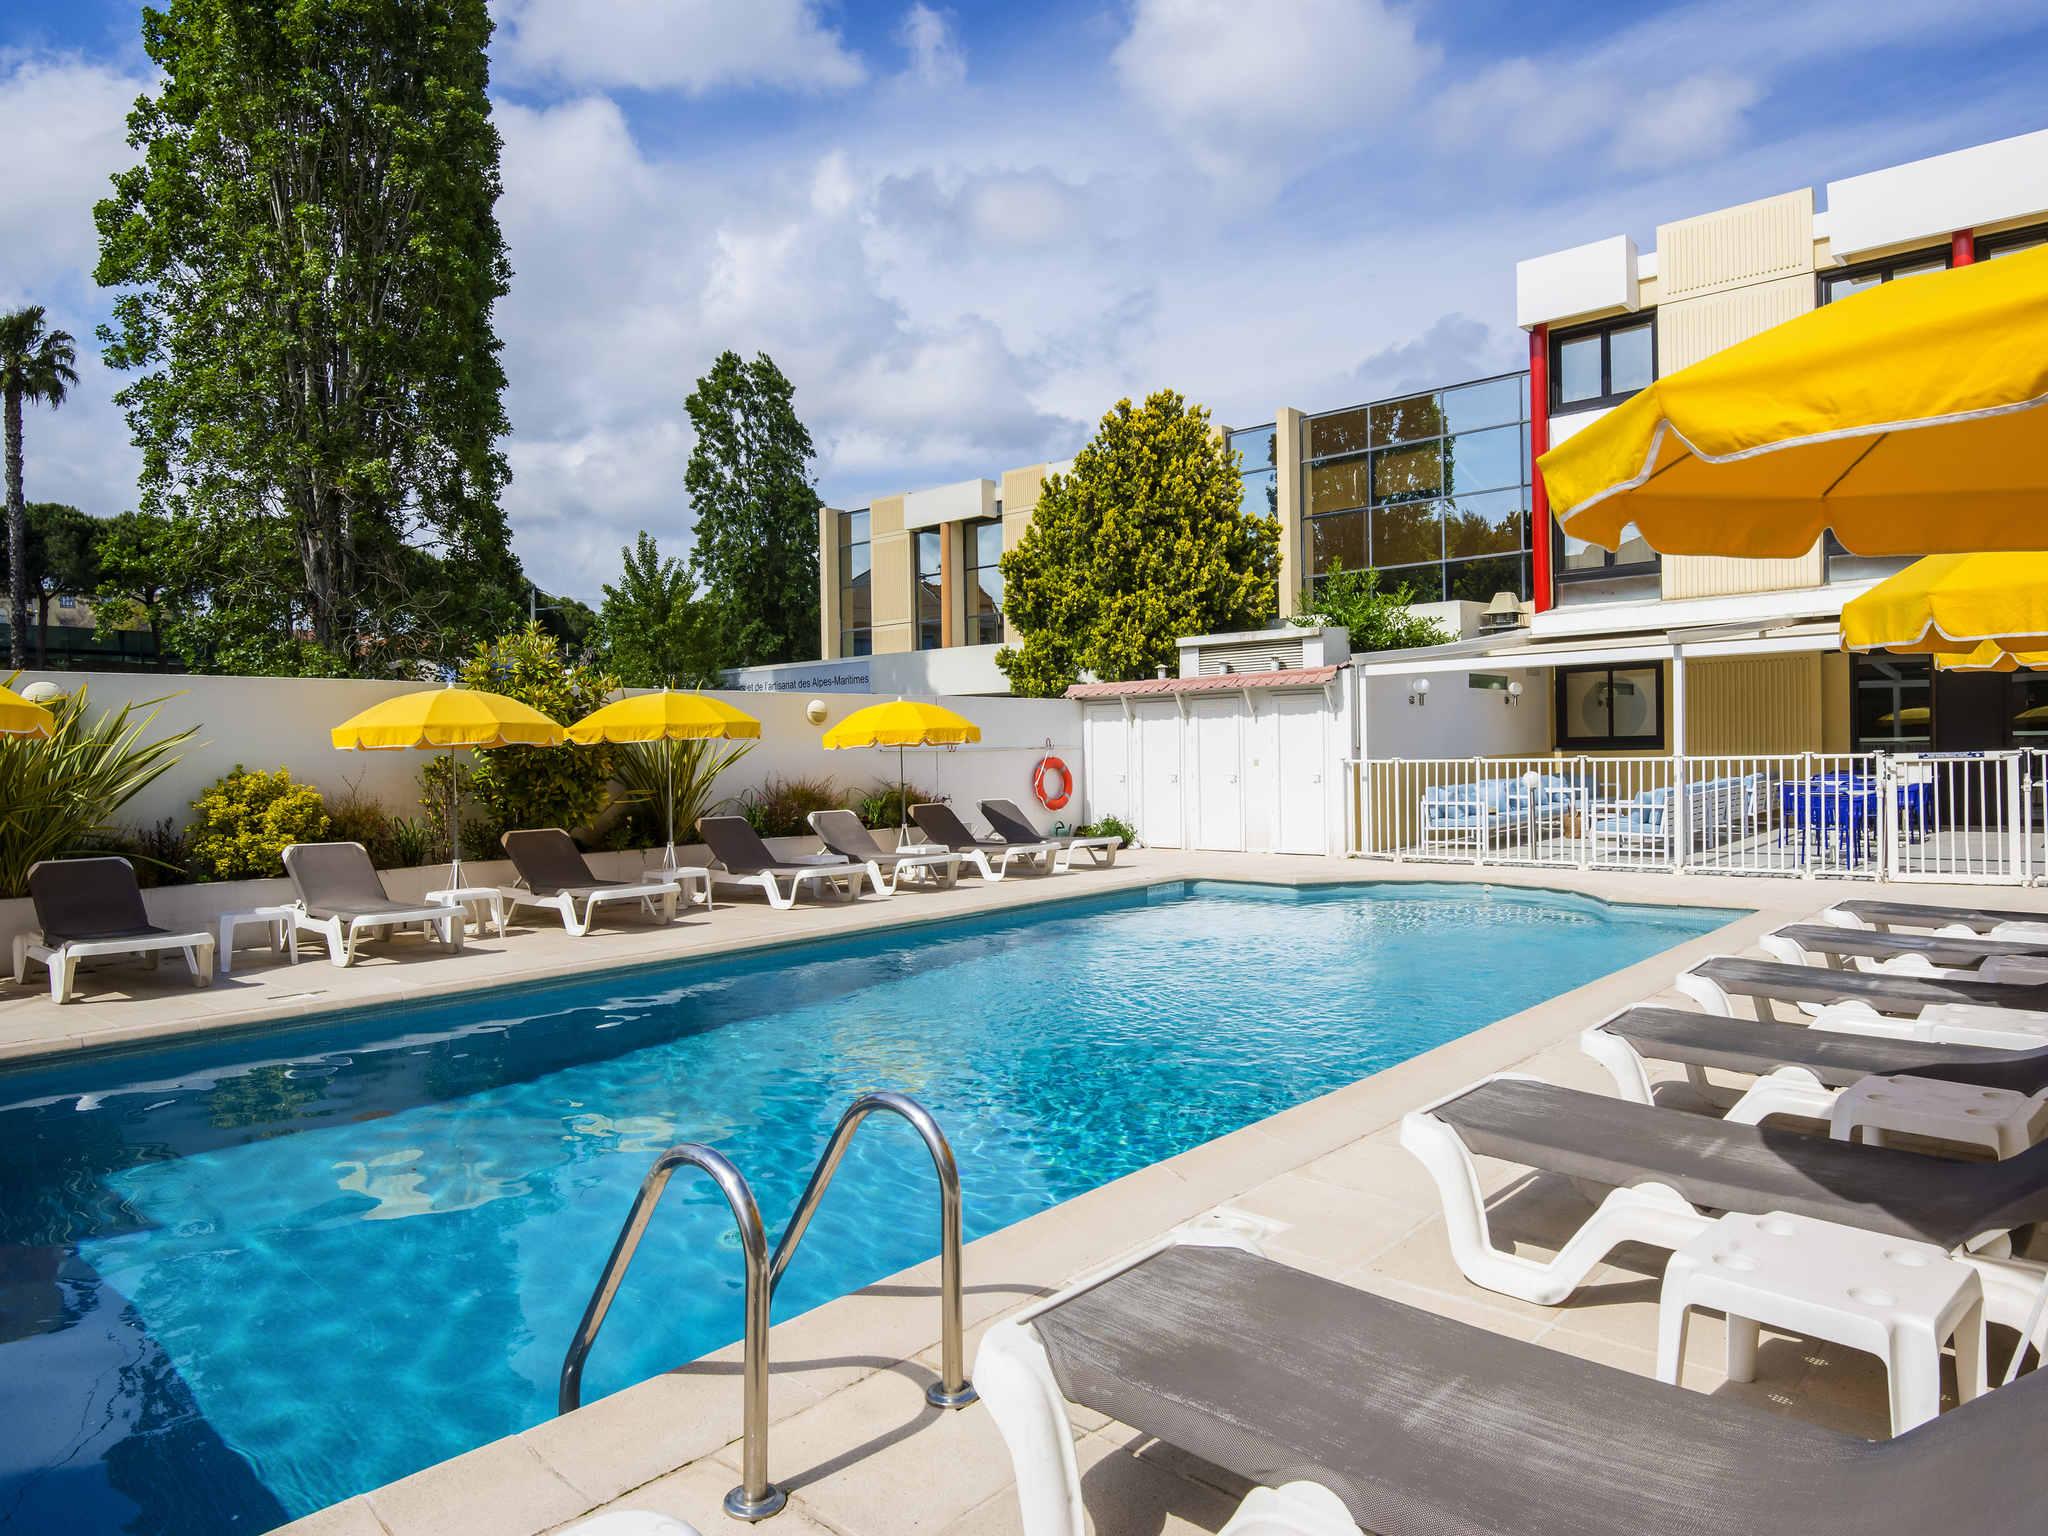 Hotell – HOTEL MERCURE NICE CAP 3000 (Futur Ibis Styles)